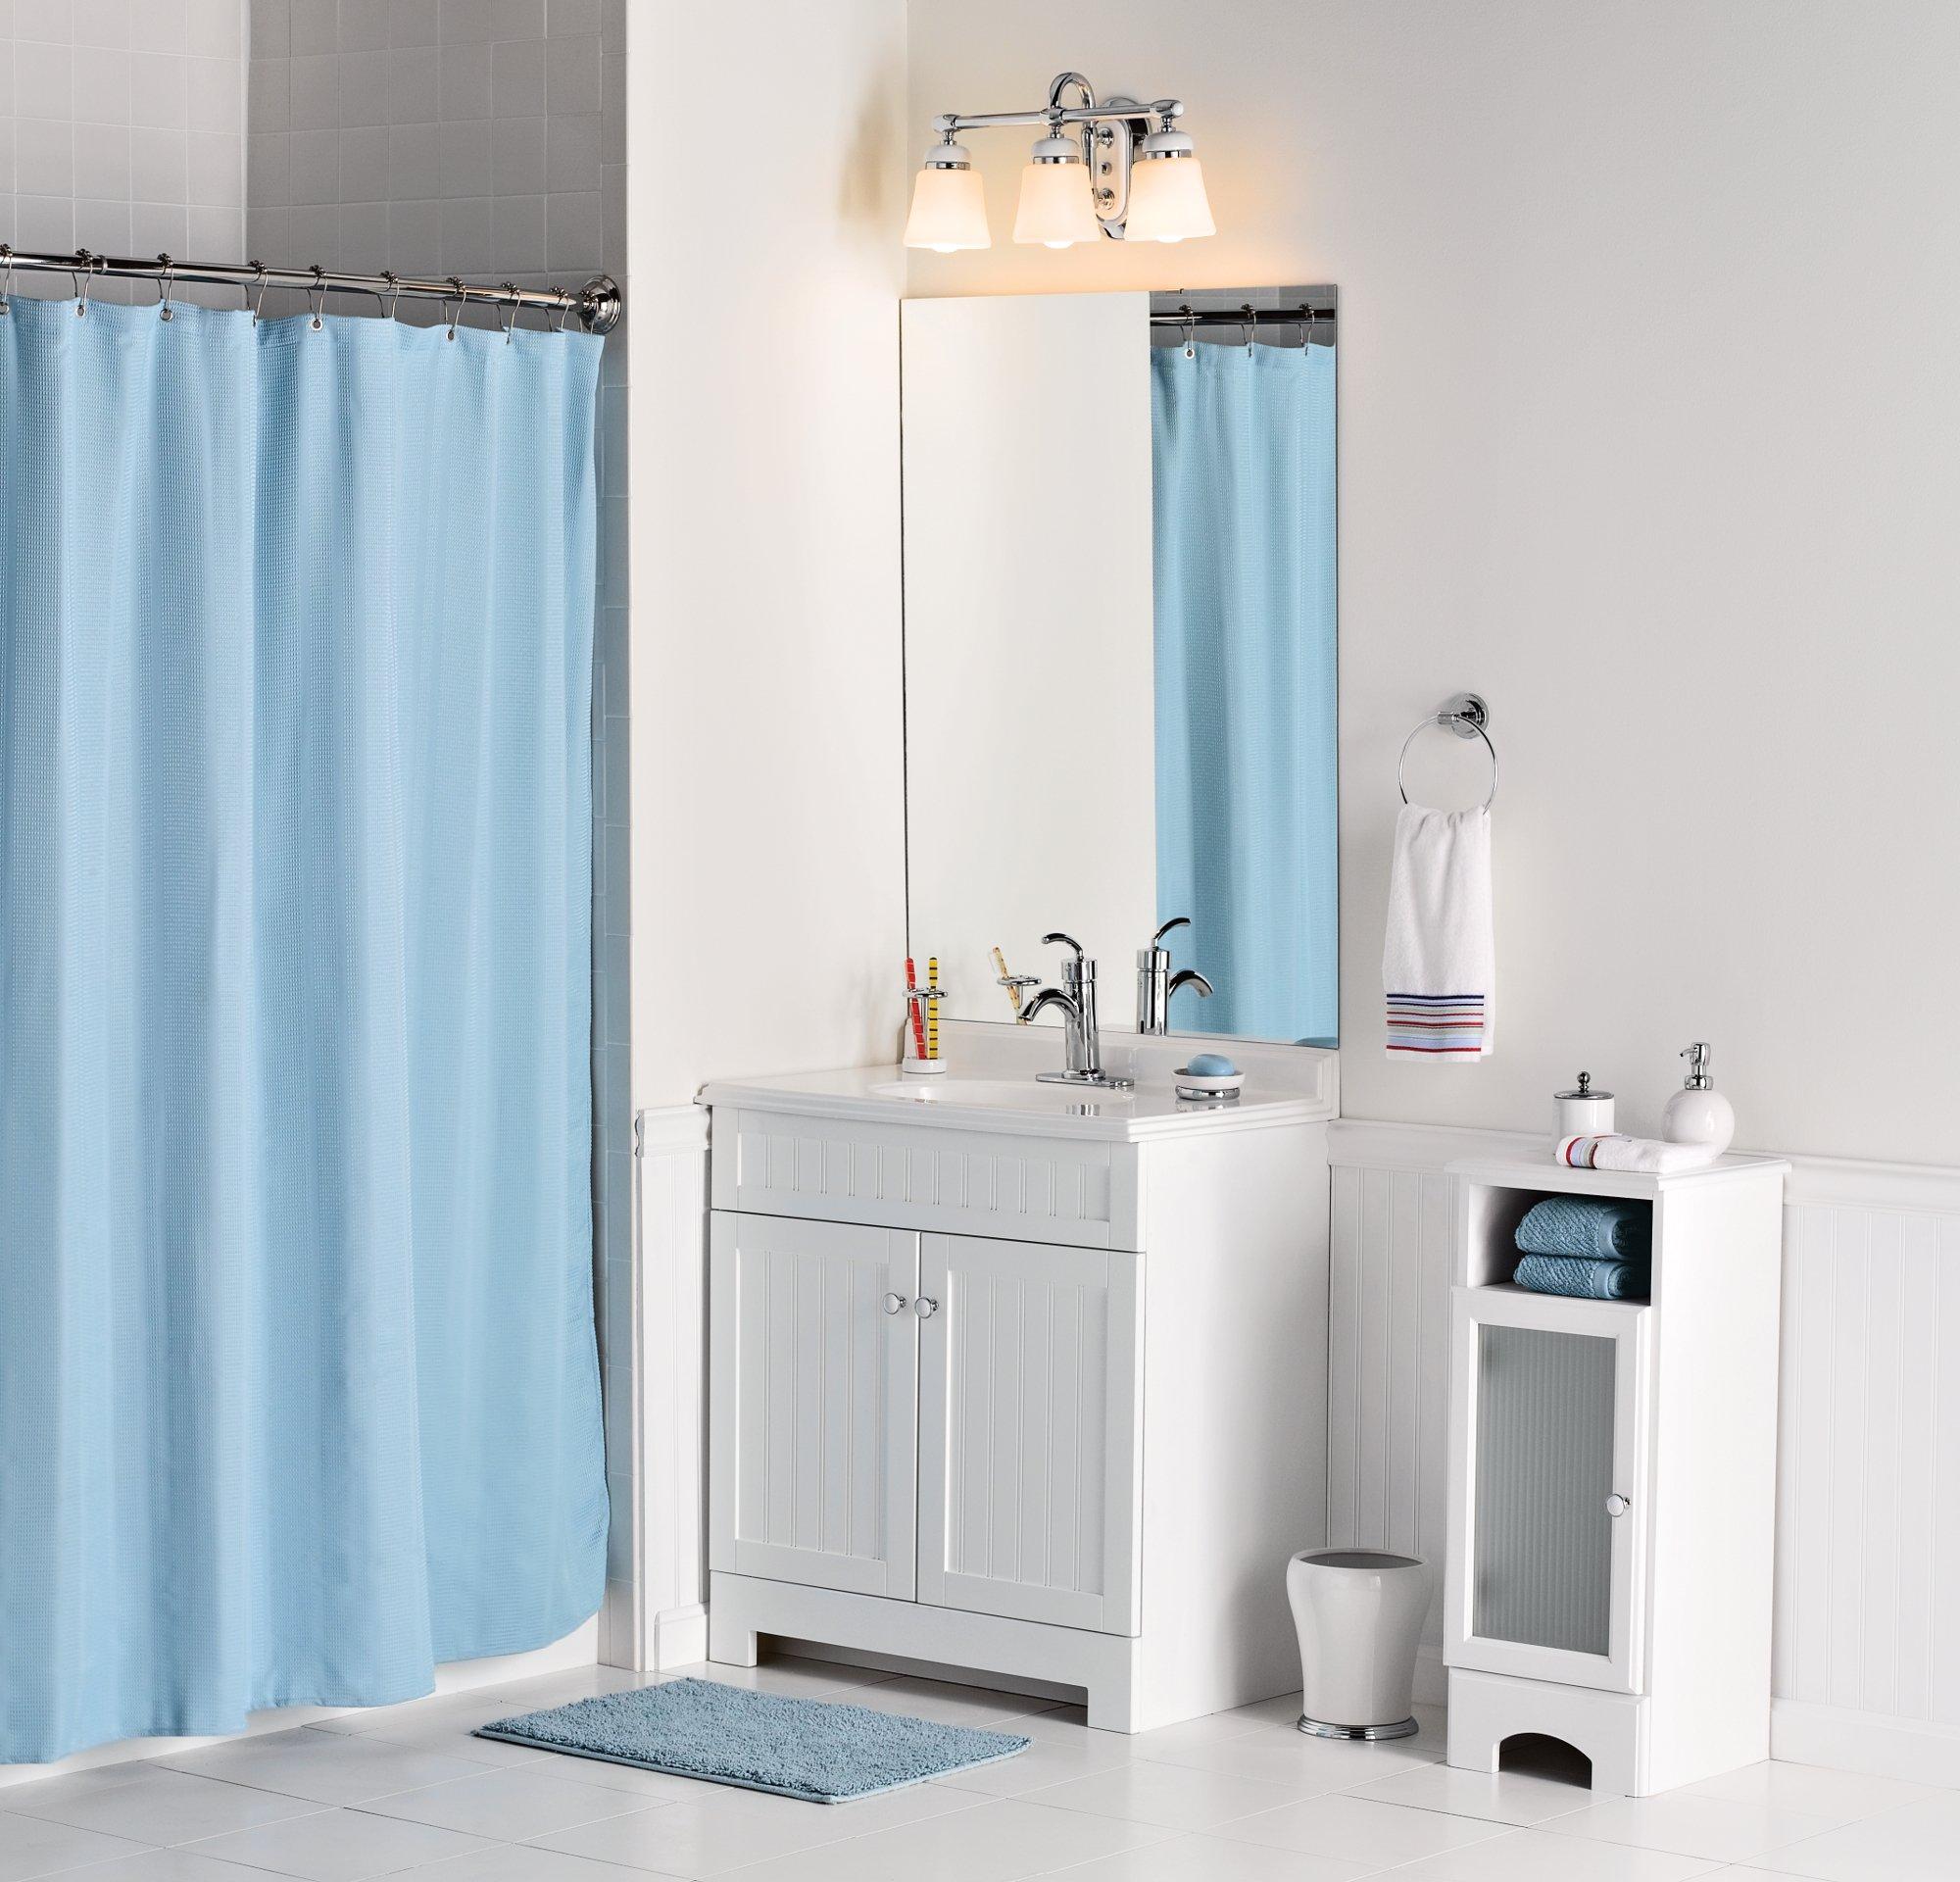 Moen DN0786CH Iso Bathroom Towel Ring, Chrome